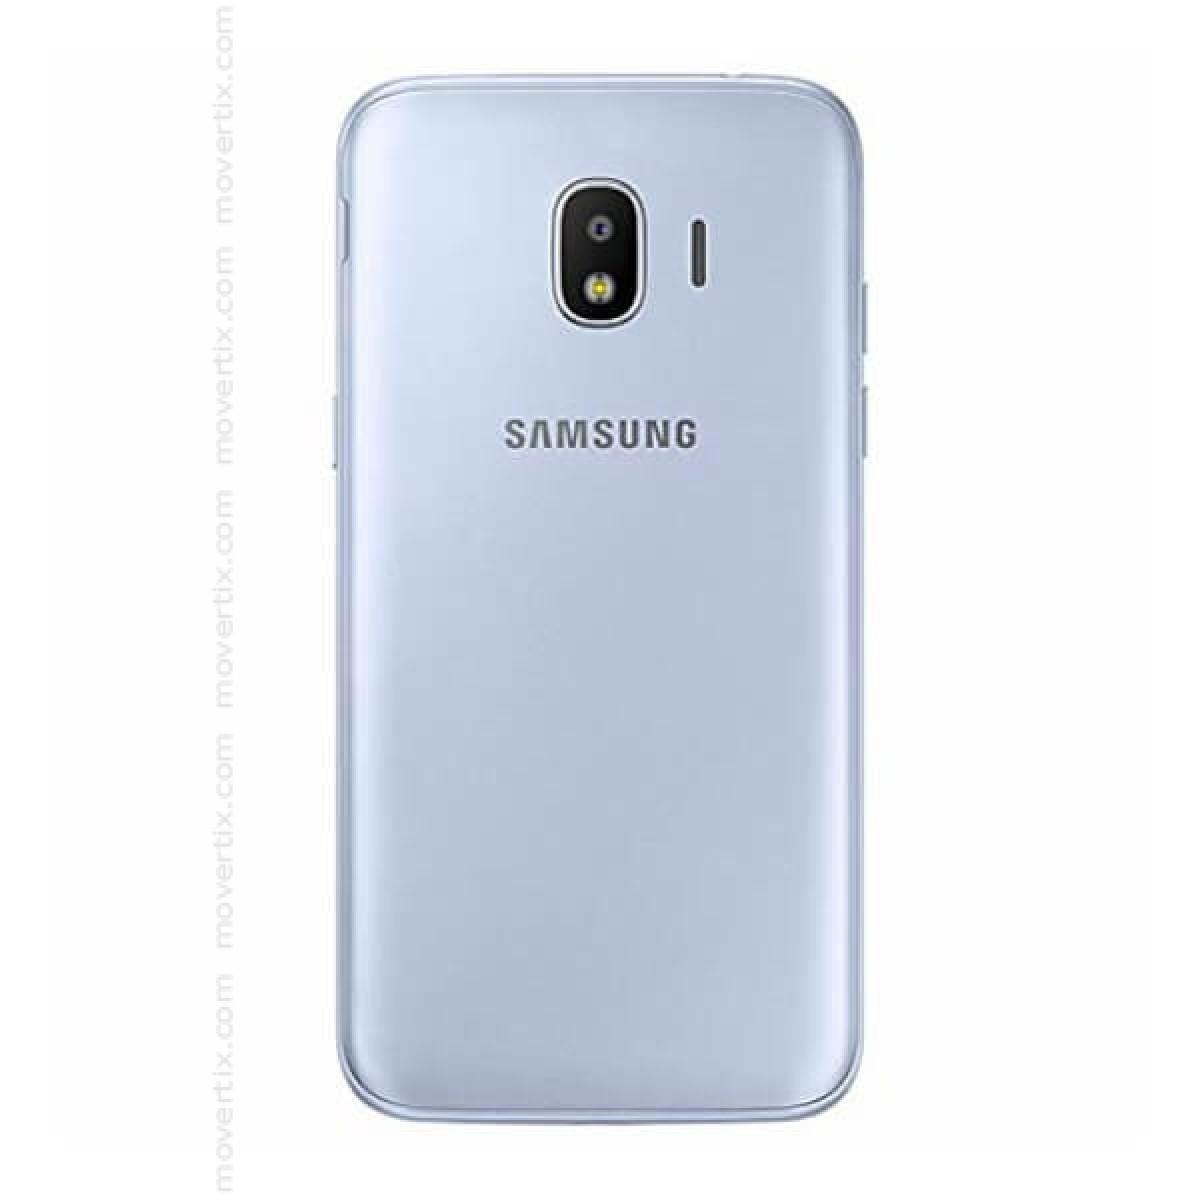 Samsung Galaxy J2 2018 Double SIM Bleu